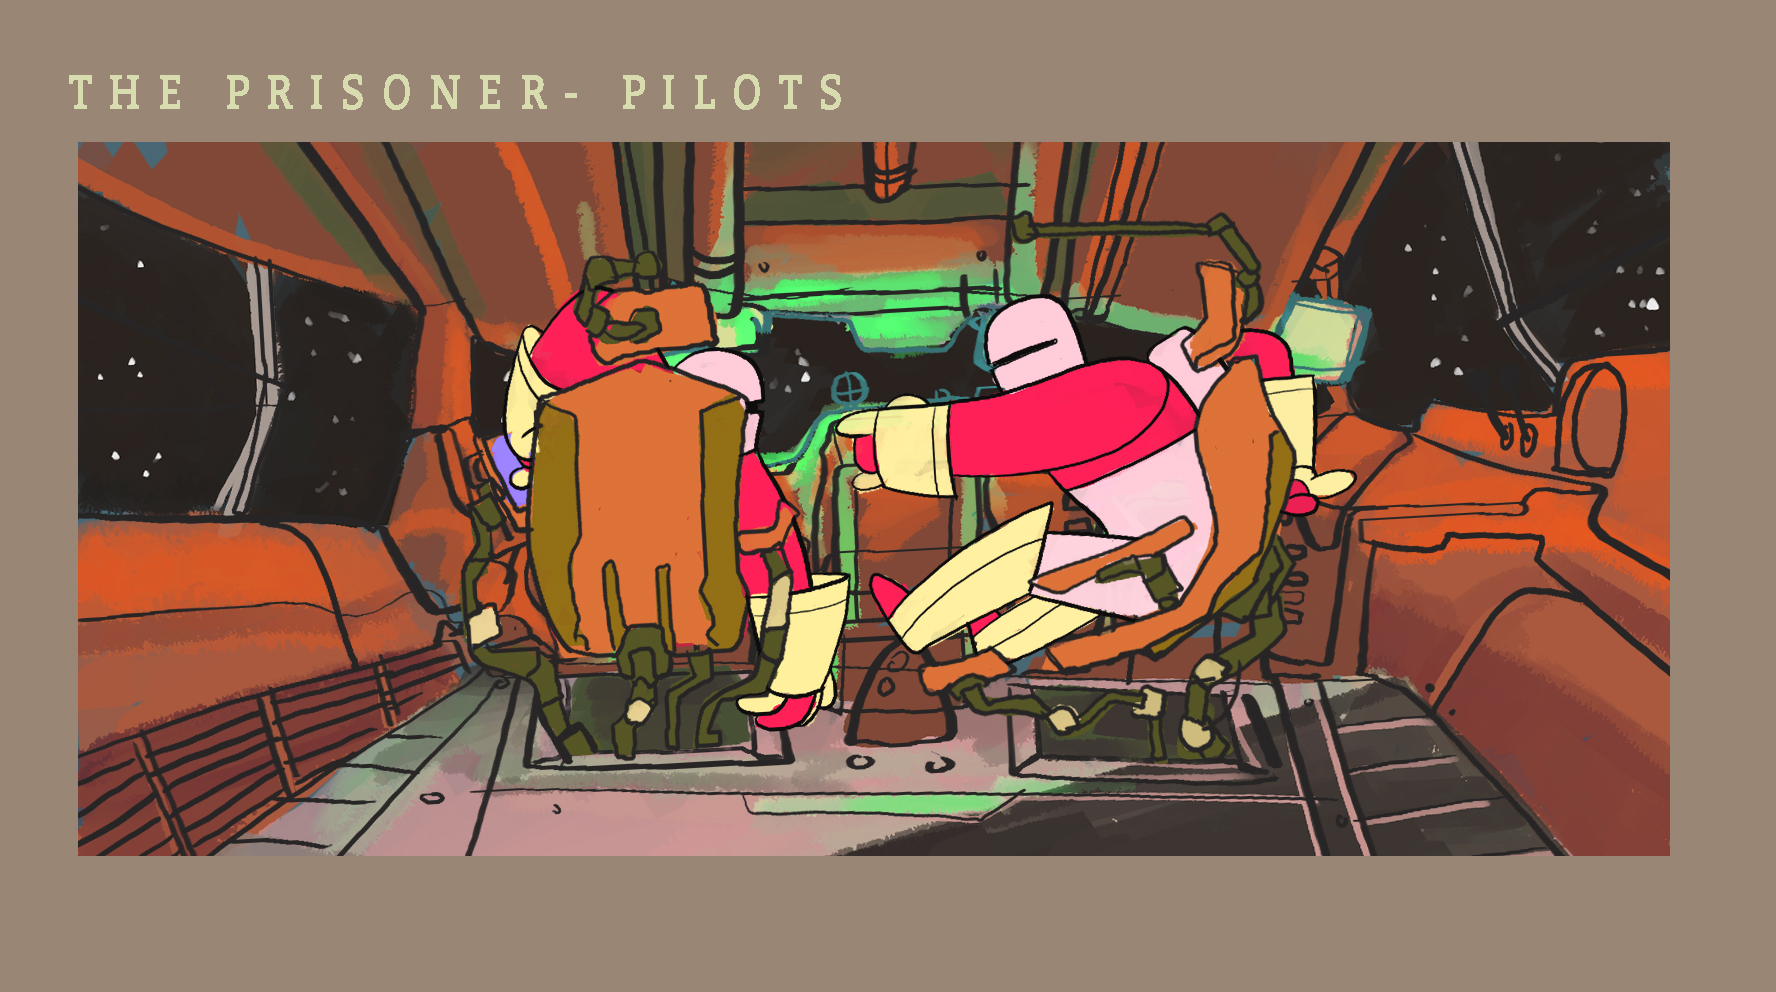 Ship_int_pilots.jpg